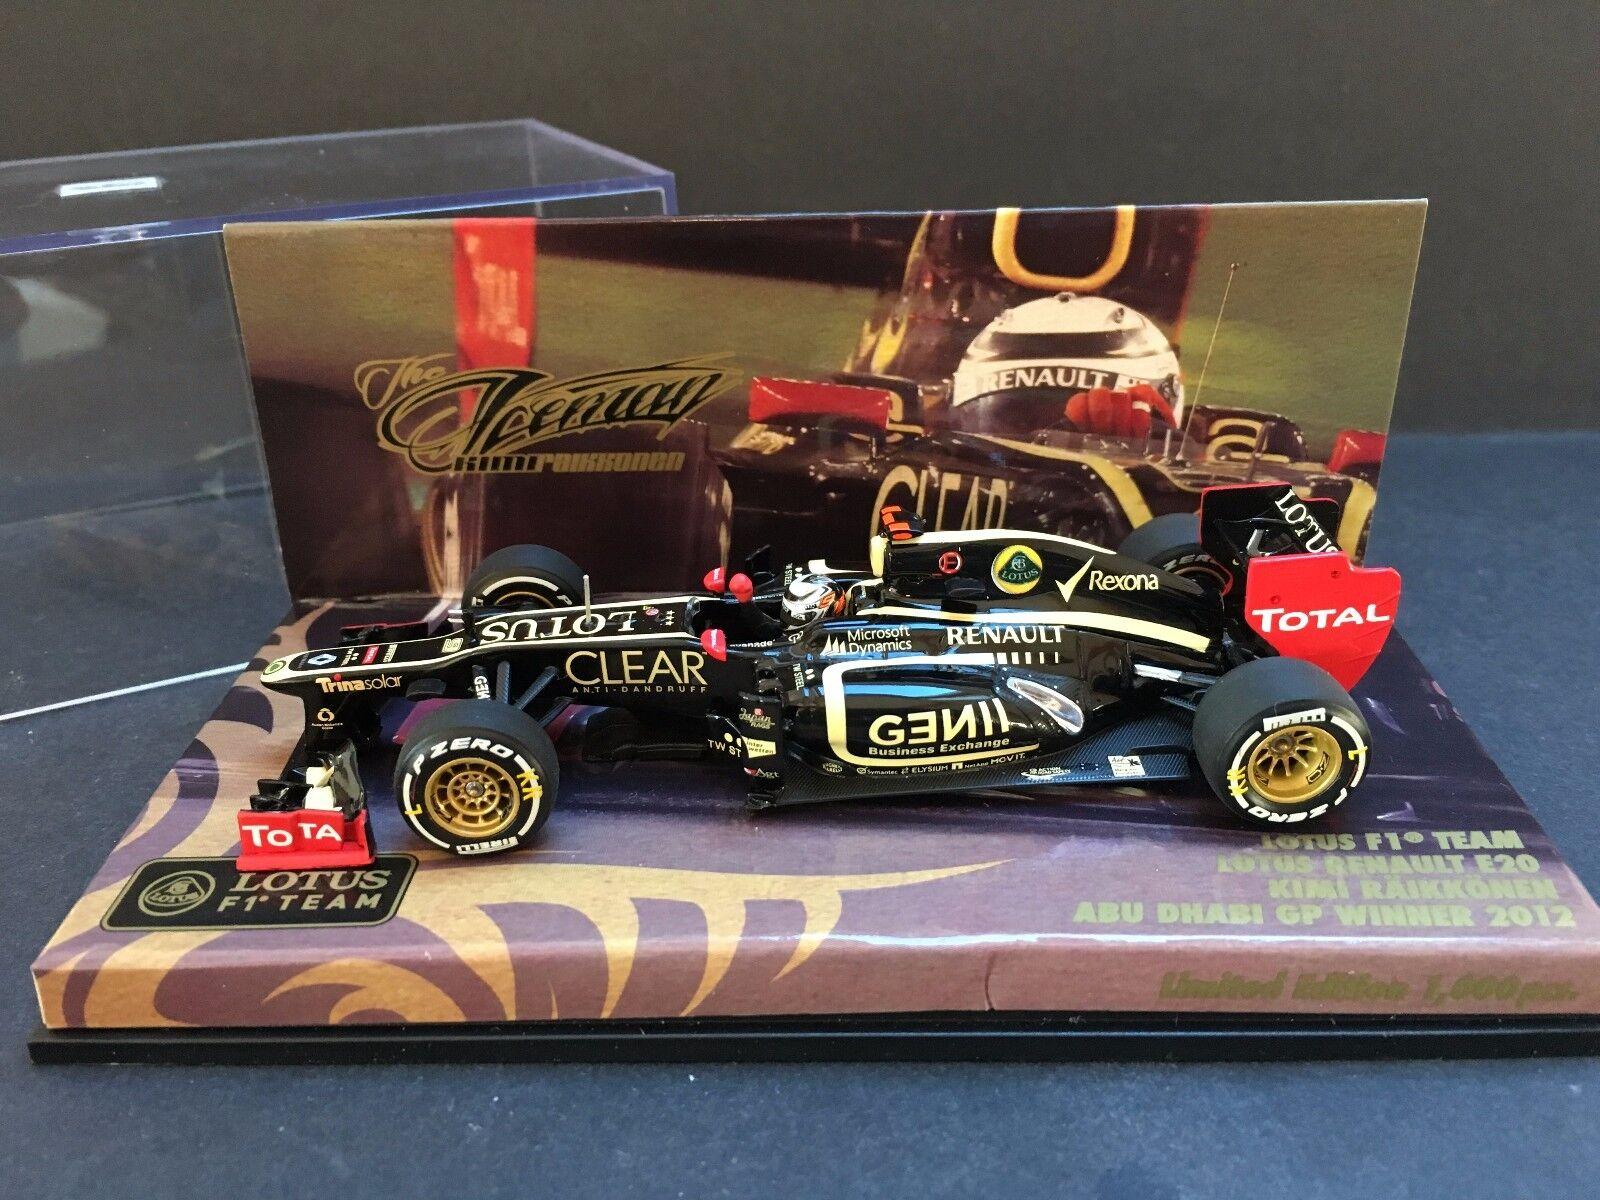 Minichamps - Kimi Raikkonen - Lotus - E20 - 2012 - Abu Dhabi GP Winner - 1:43